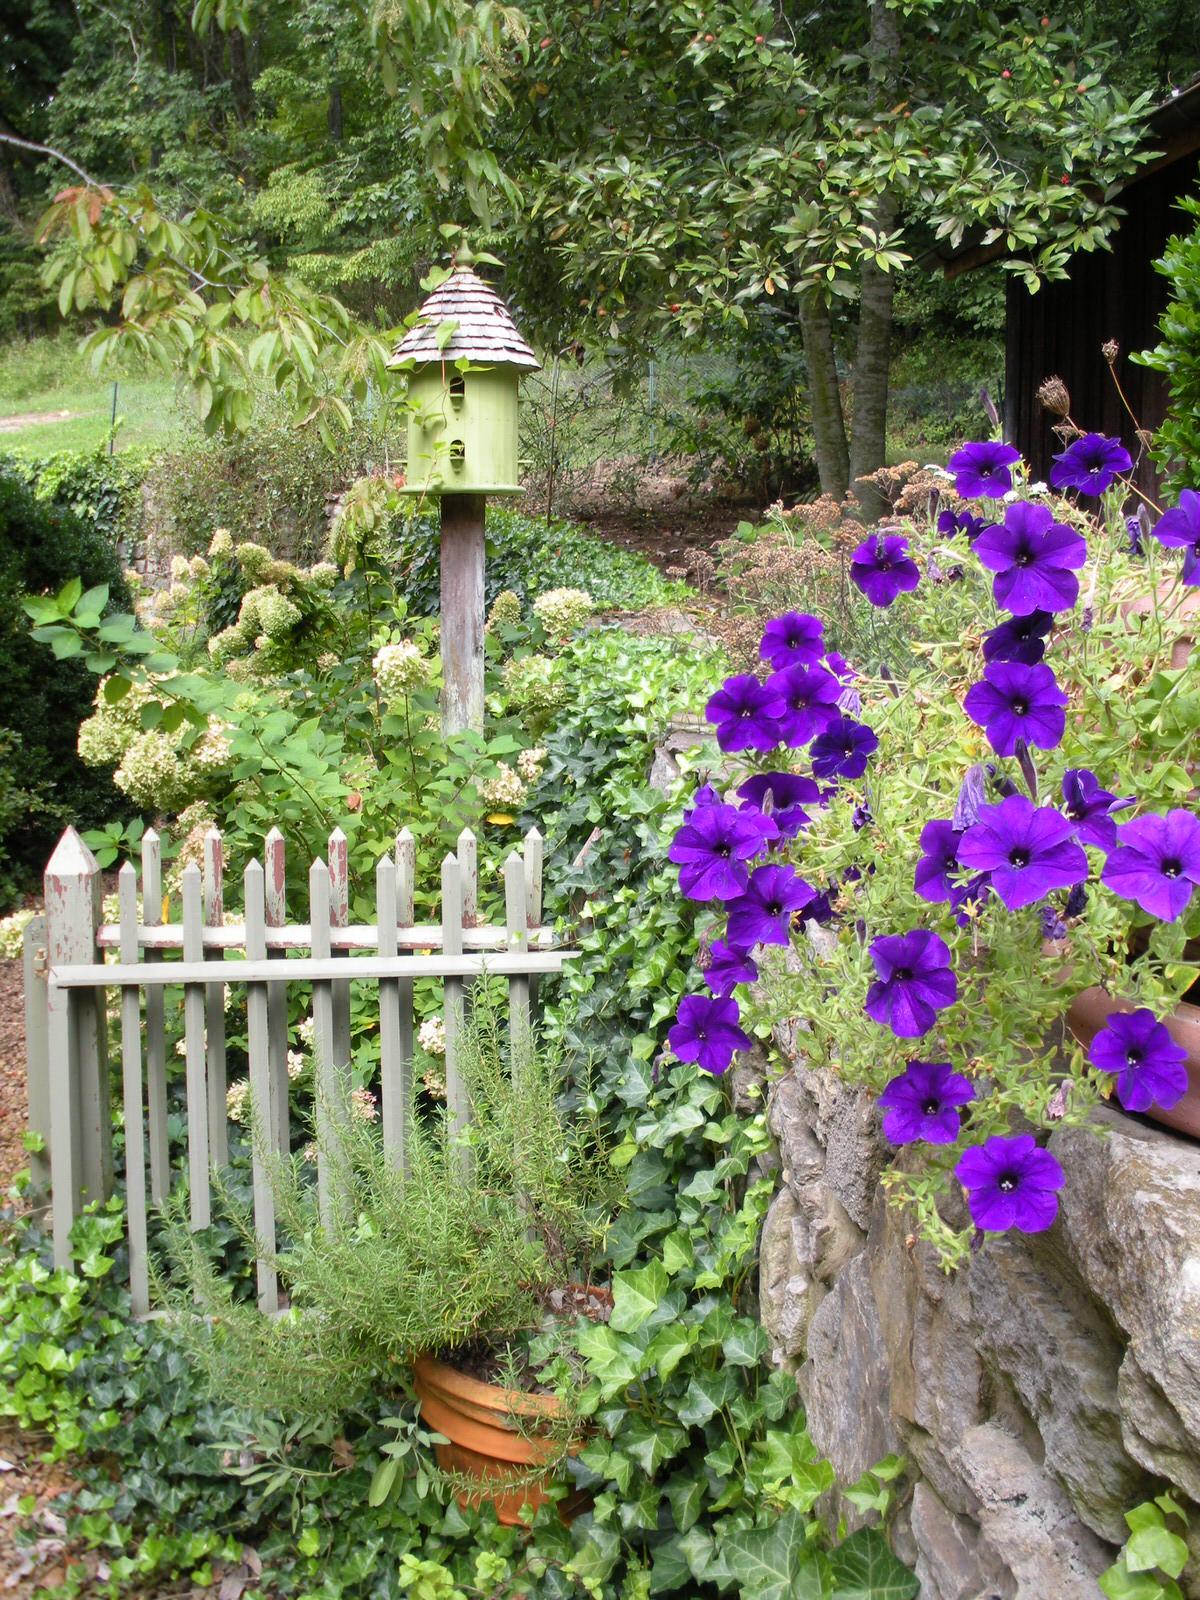 Justin Stelter Landscape Gardening - Country Garden - Justin Stelter Landscape Gardening - Country Garden2886239049_0f6df8769f_o.jpg